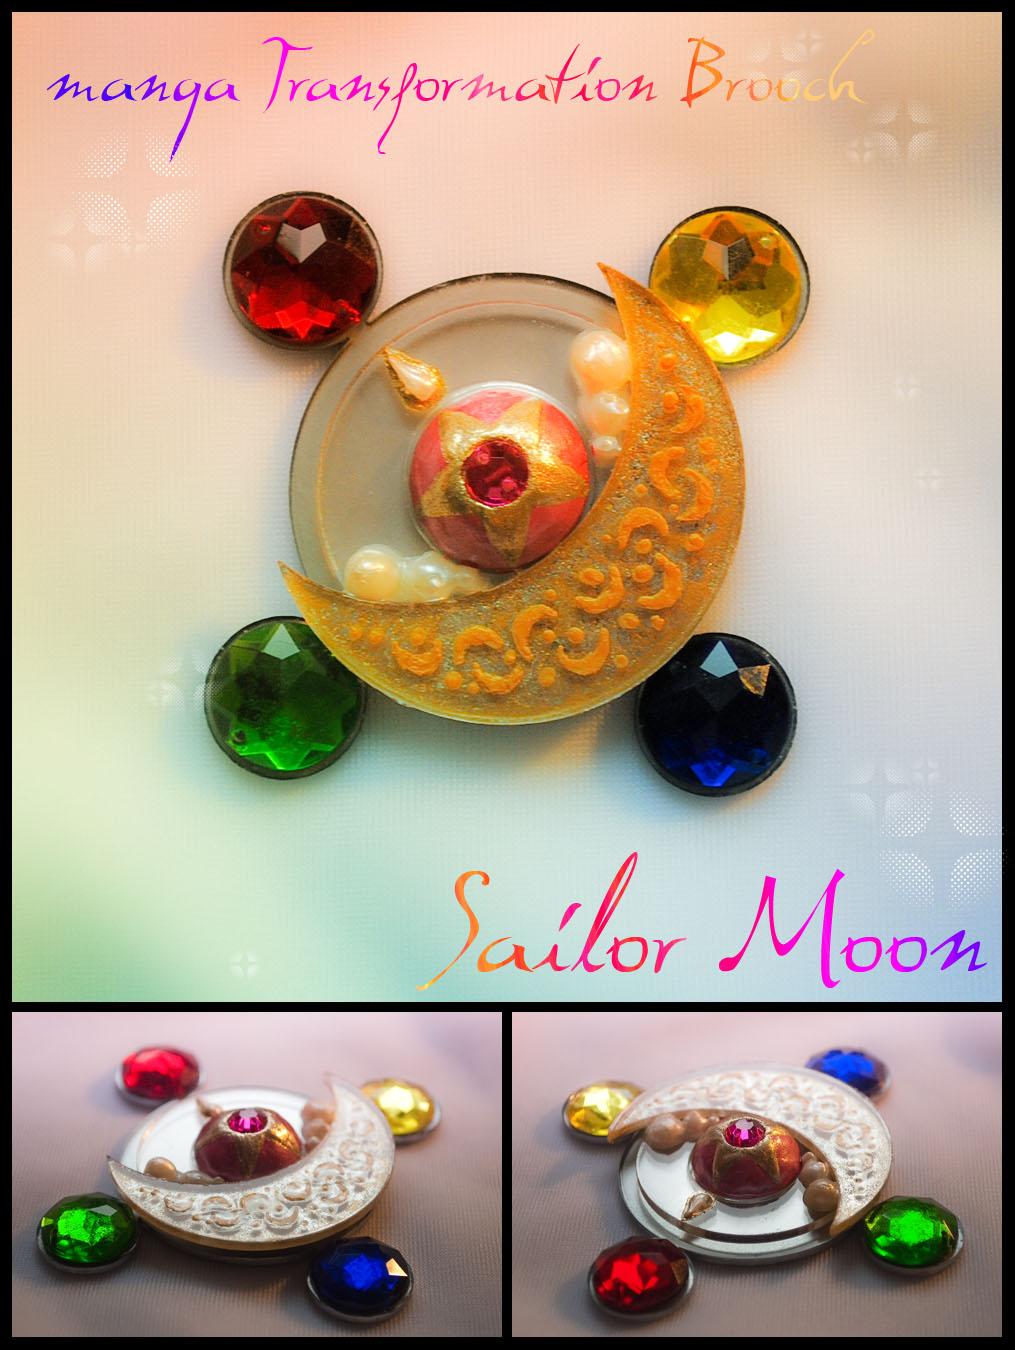 Props: Sailor Moon - manga Transformation Brooch by Hybryda